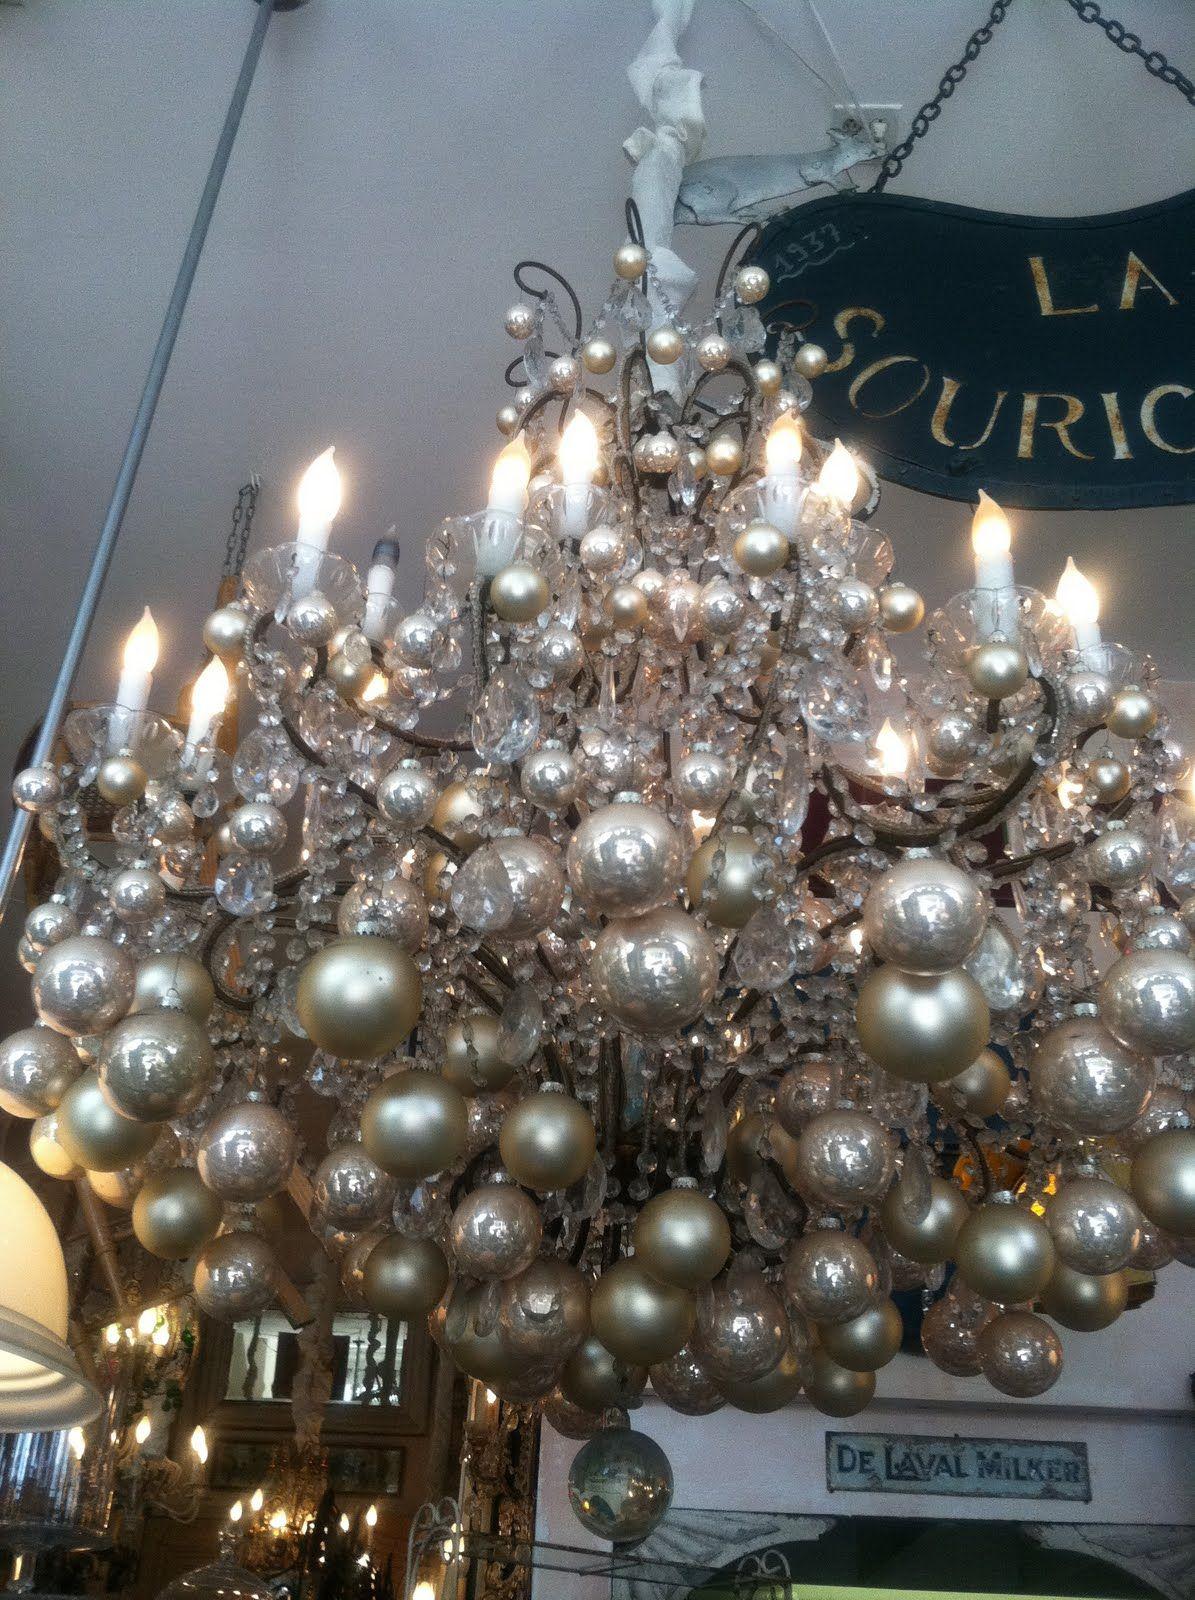 Chandelier with an abundance of creamy white ornamentselegant